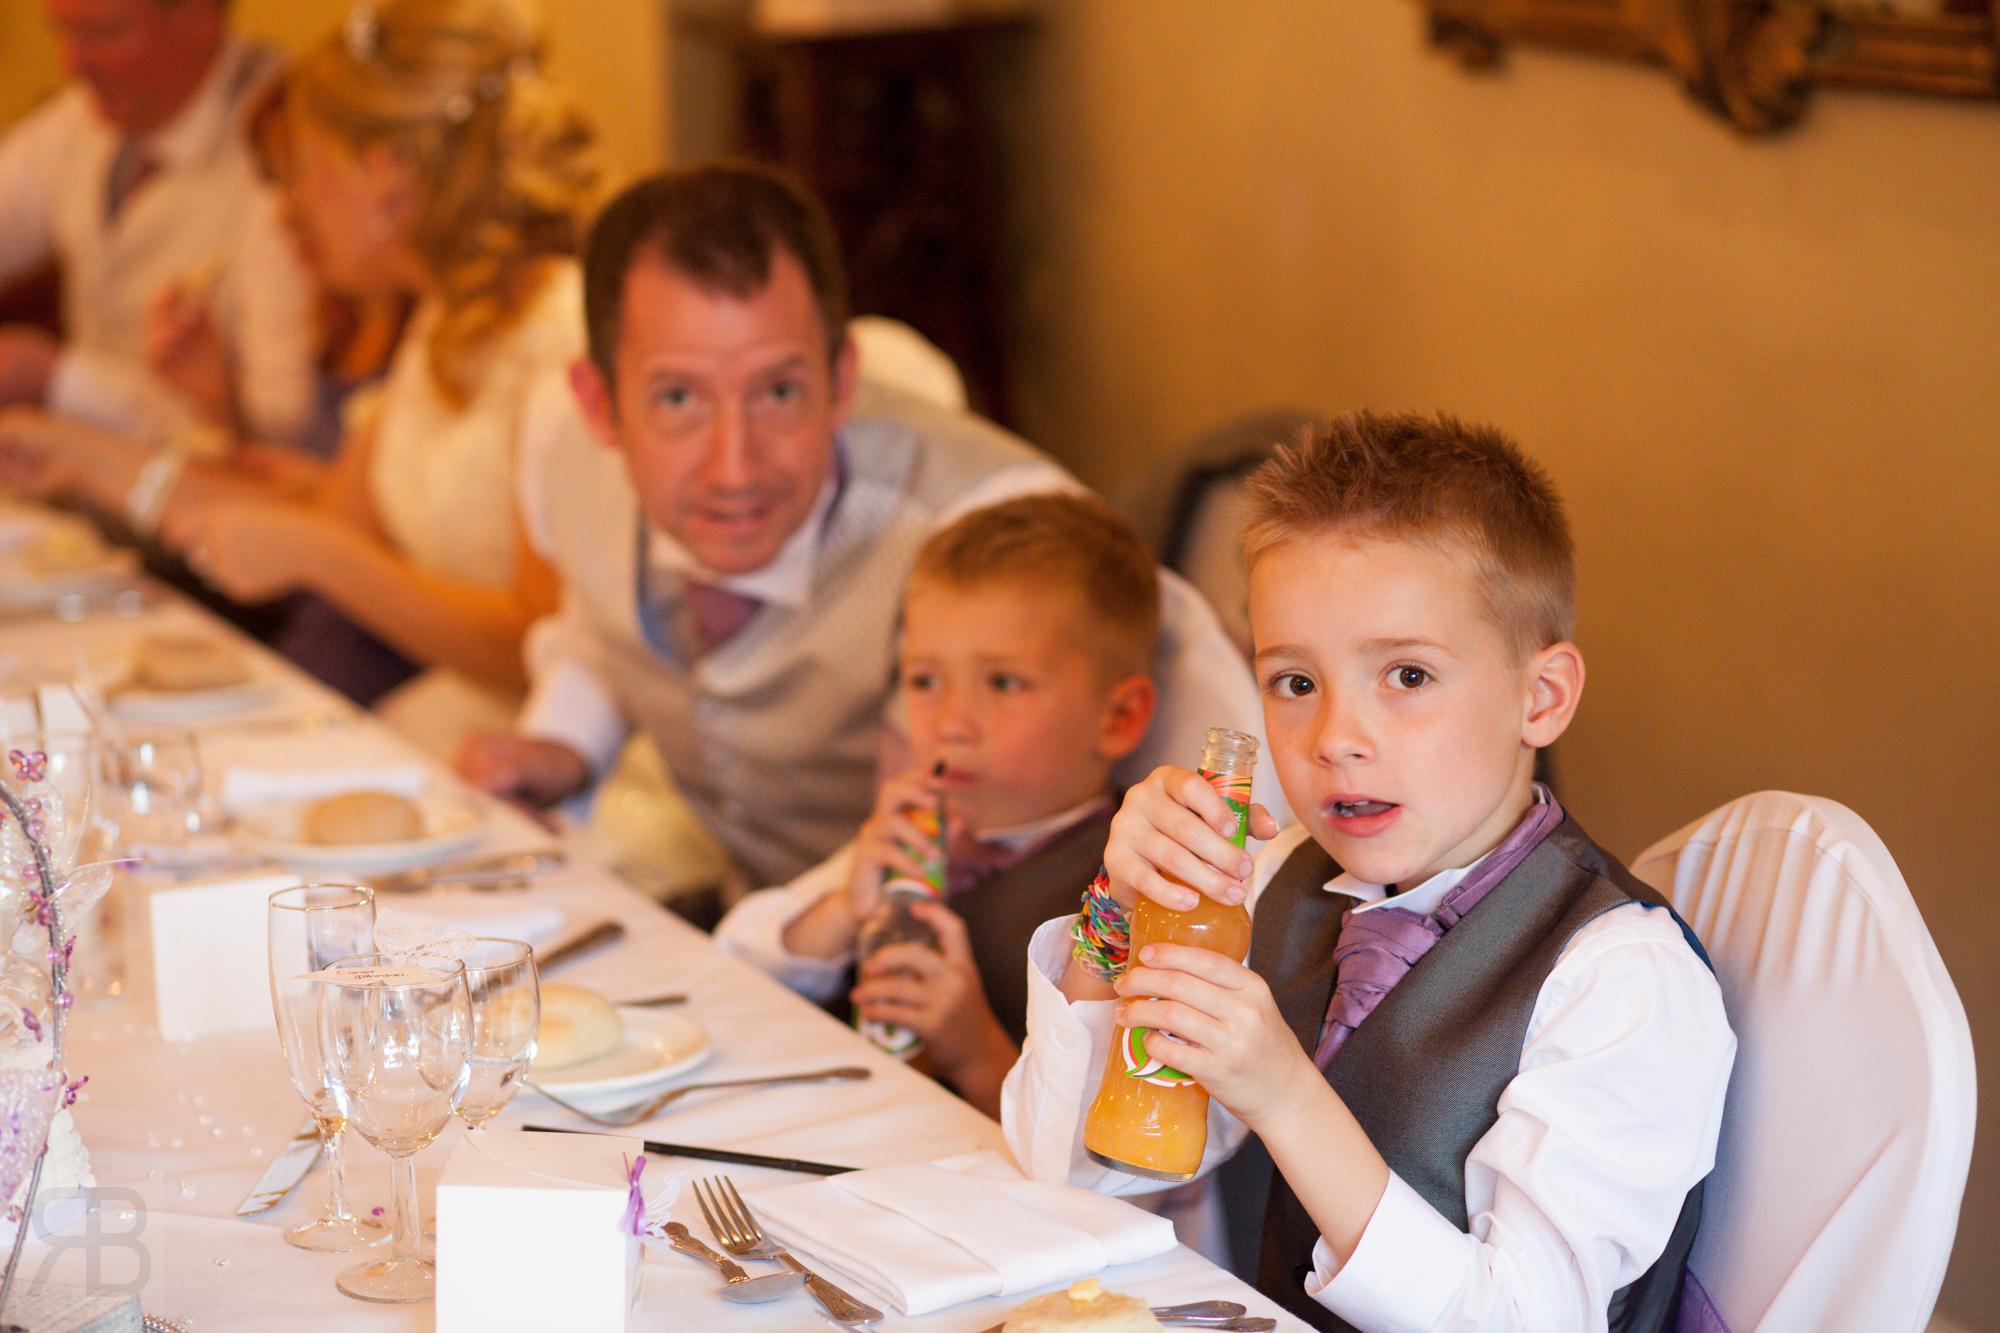 110715_LisaCraigJohnson_Wedding_5946538_WebWM.jpg